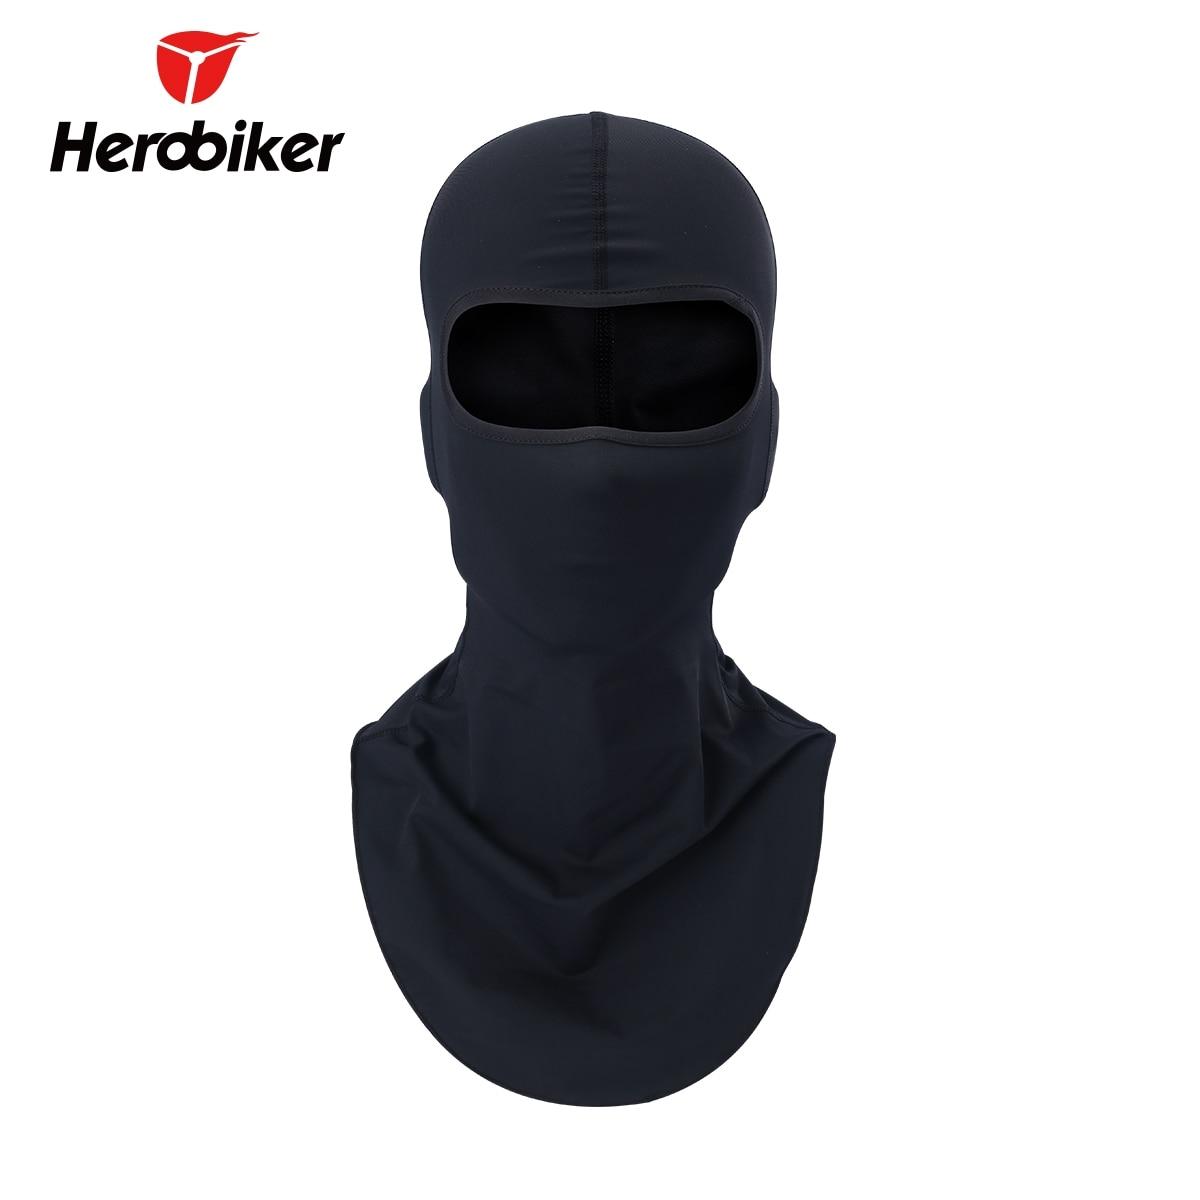 цена на HEROBIKER Motorcycle Mask Balaclava Face Shield Biker Motorbike Warmer Sun-protection Headwear Full Face Mask Motorcycle Maske